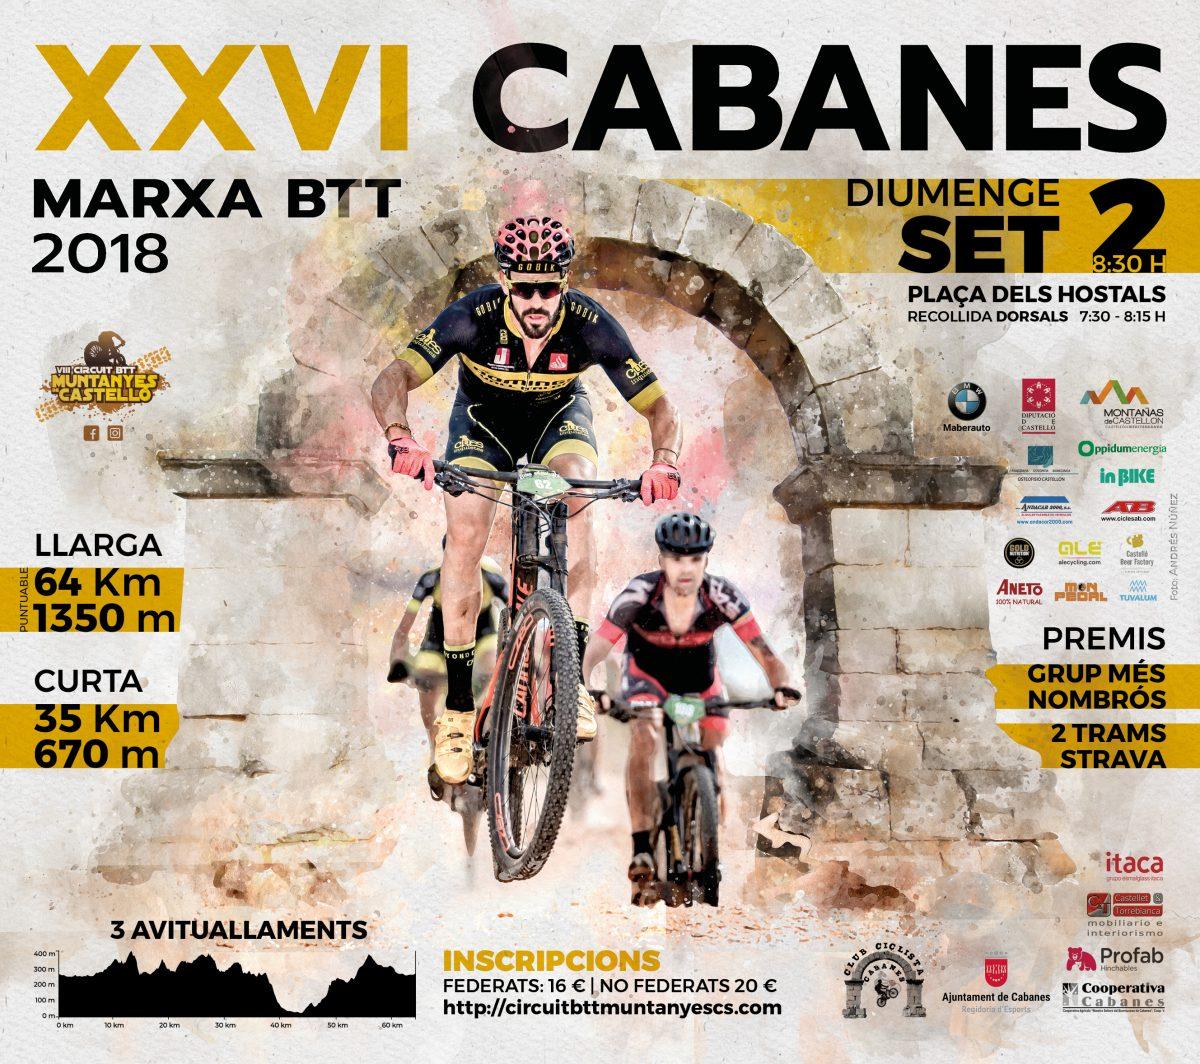 Cartel XXVI Marxa Btt Cabanes